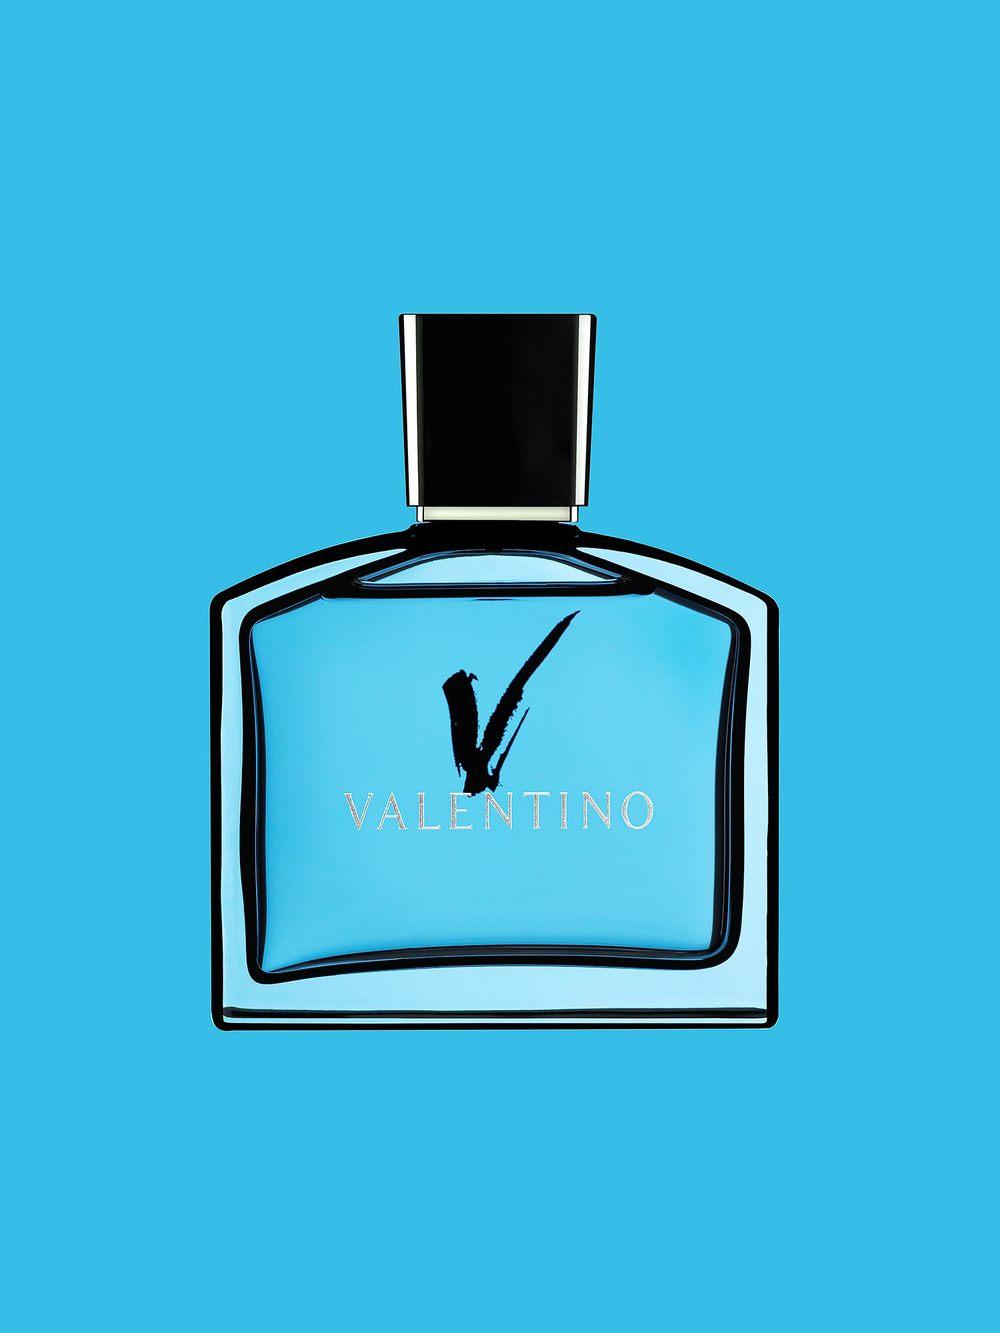 Valentino-web.jpg